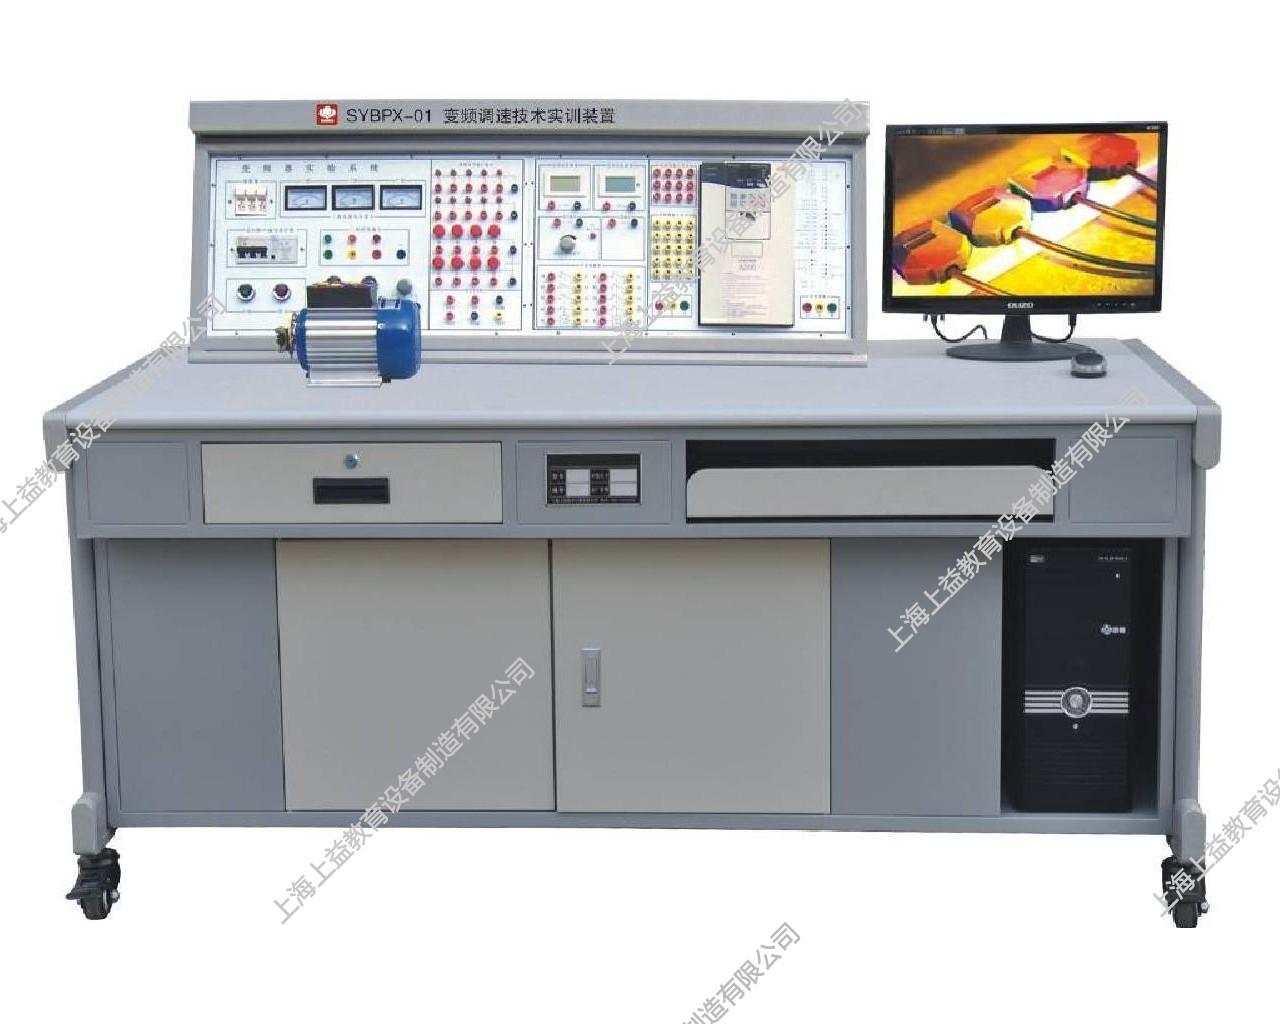 SYBPX-16变频调速技术wwwlehu8vip装置